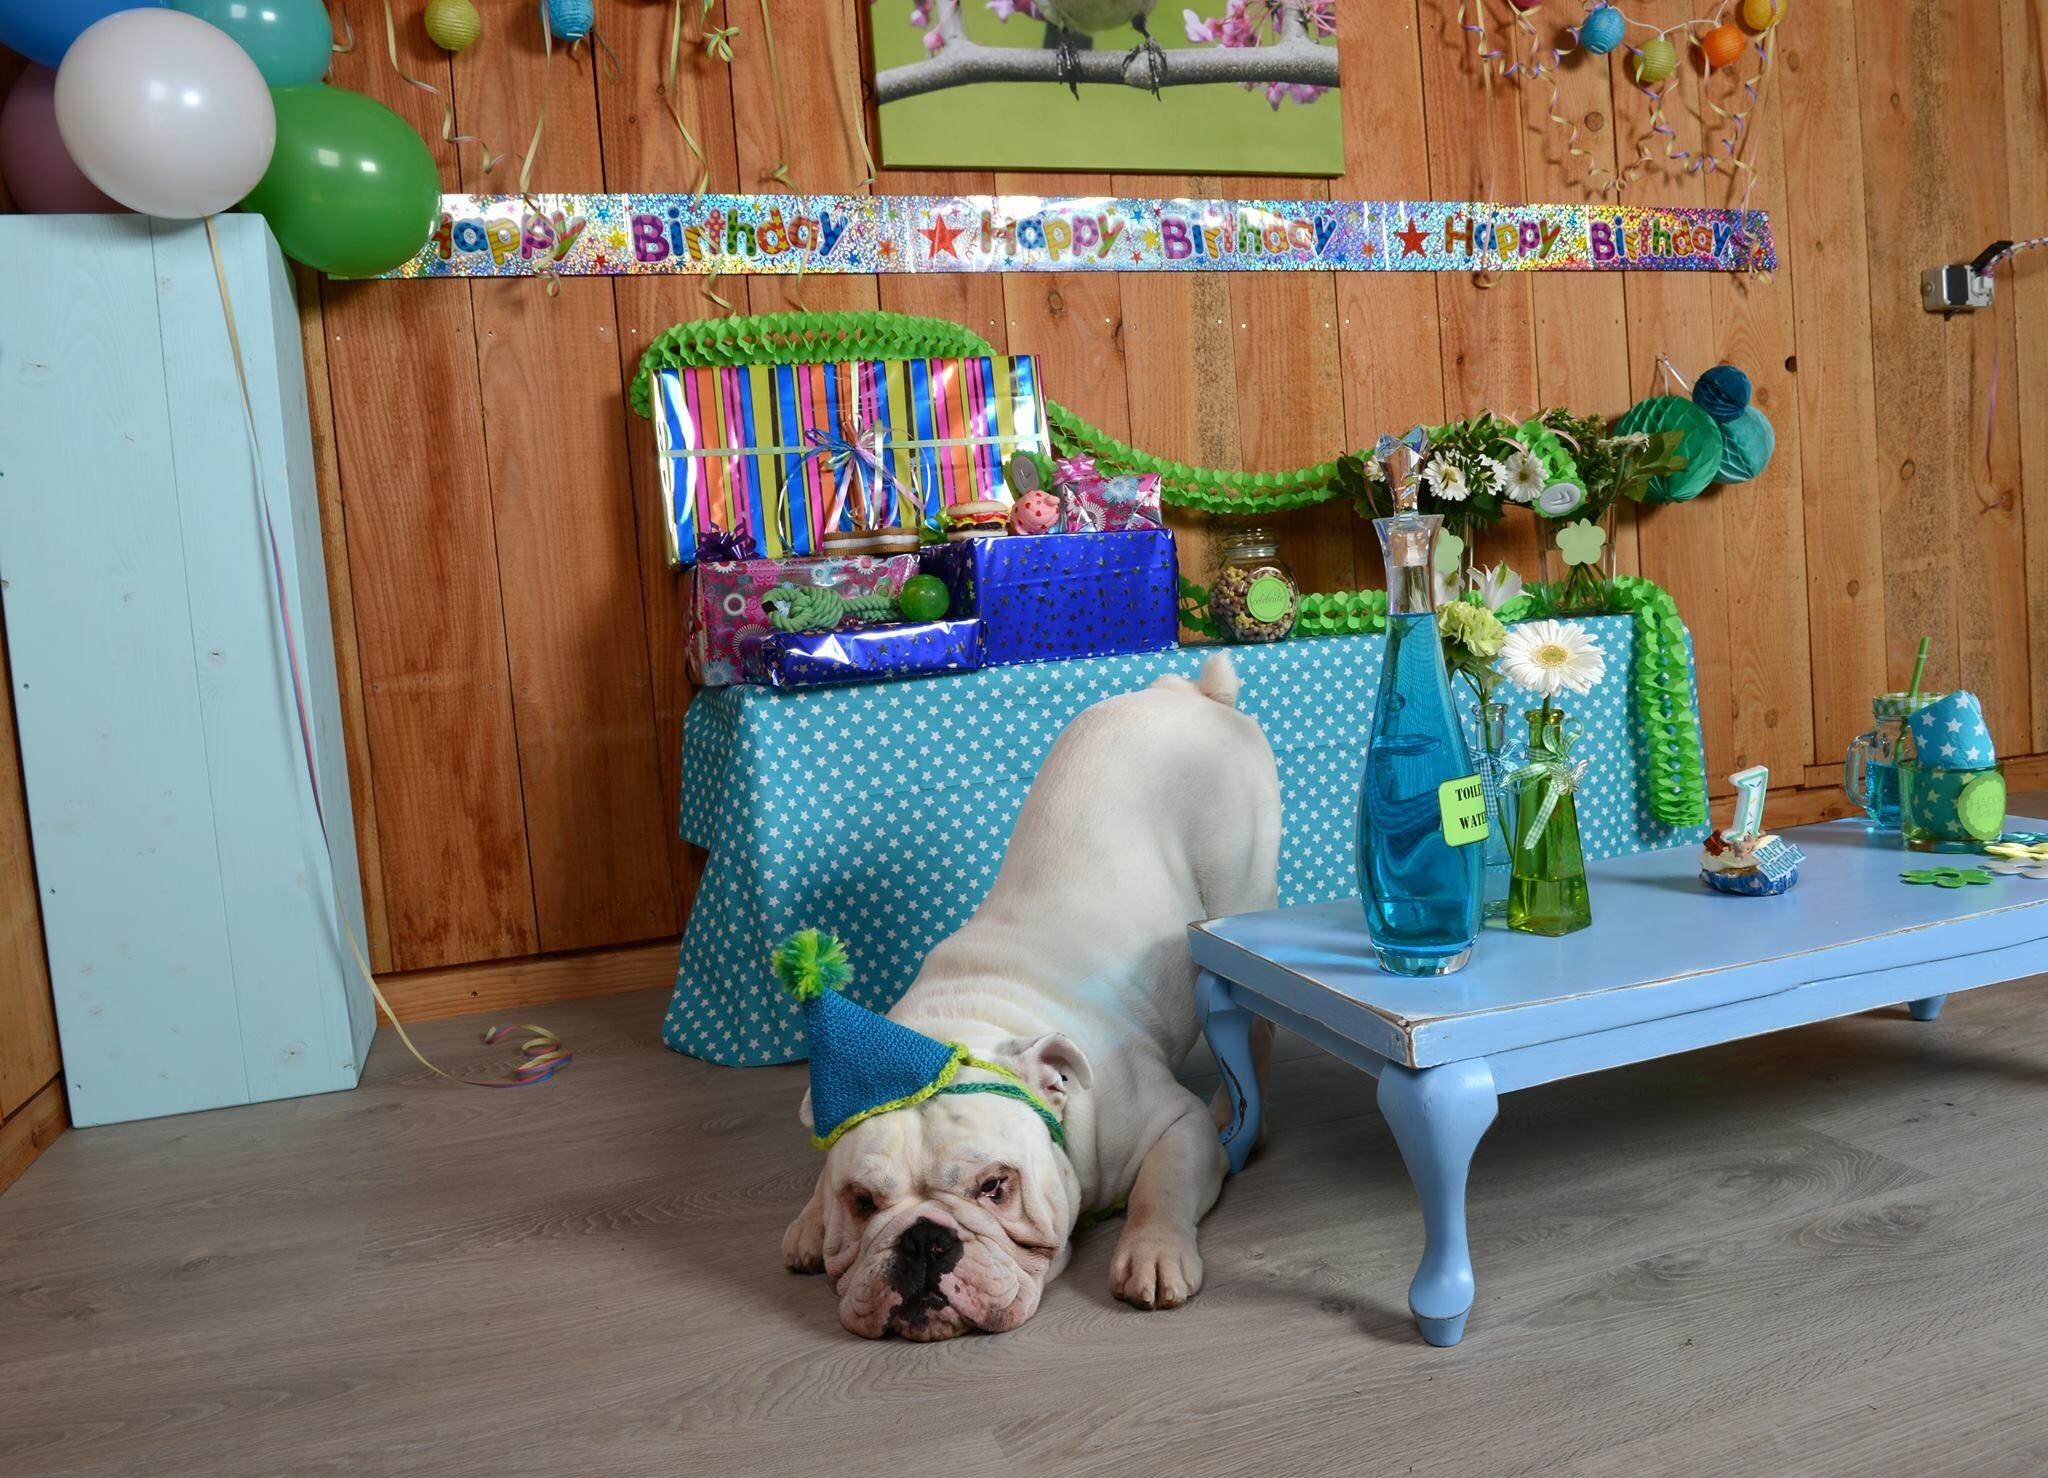 happy birthday big boy!! Hope you\re having a blast